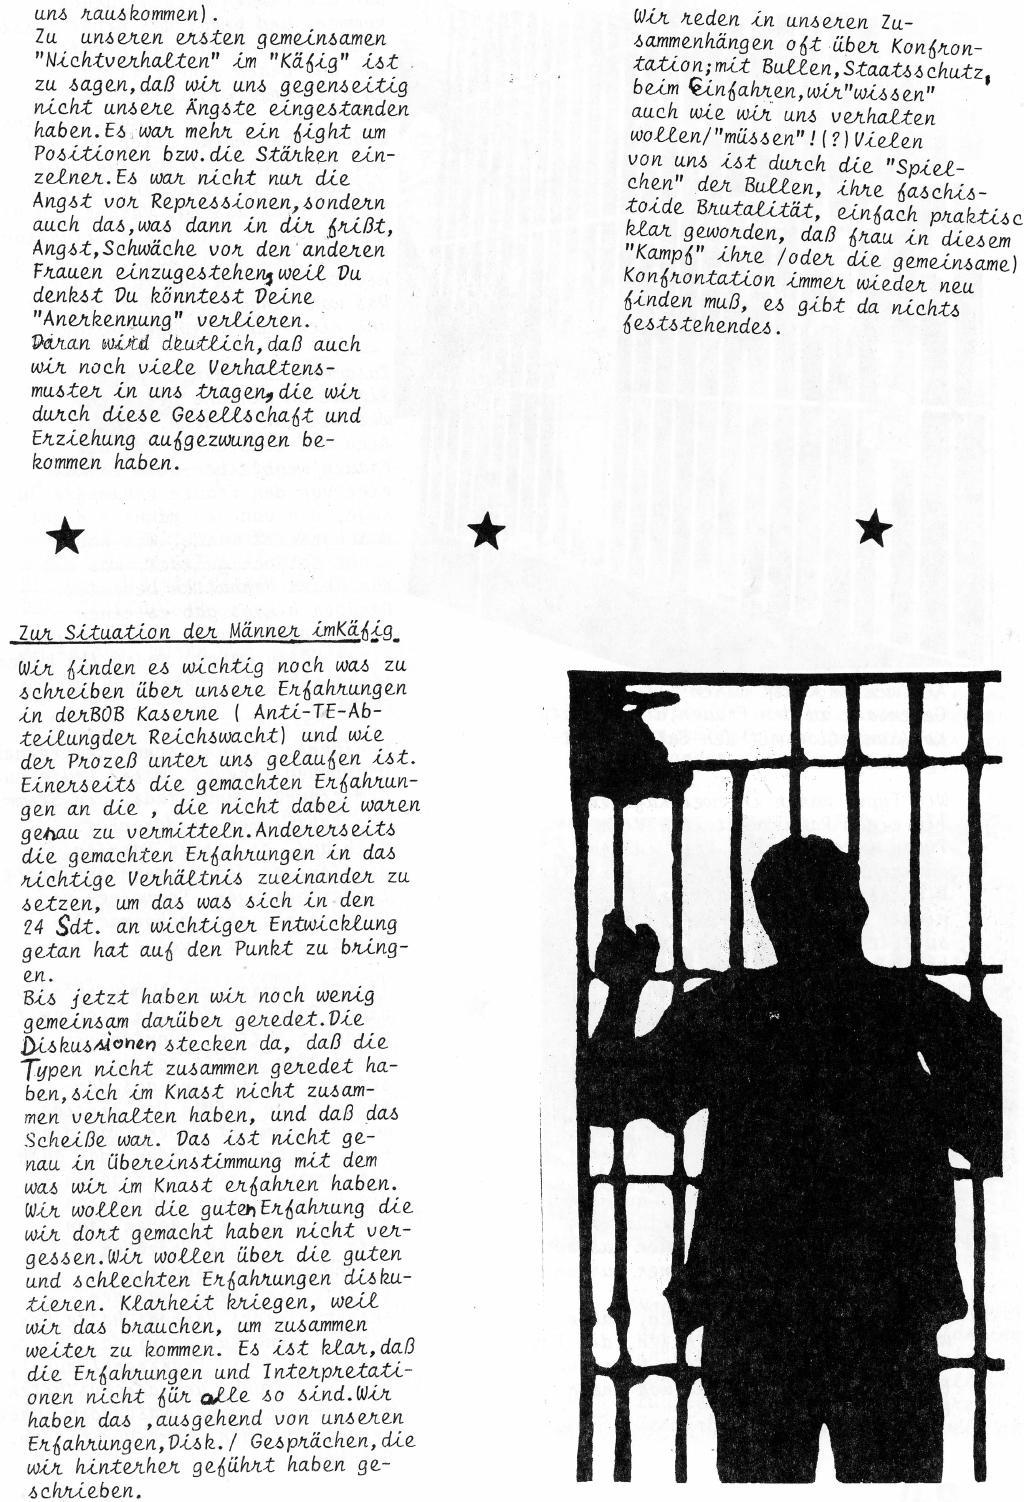 Belgien_Doku_Besetzung_EG_Kommission_1989_053